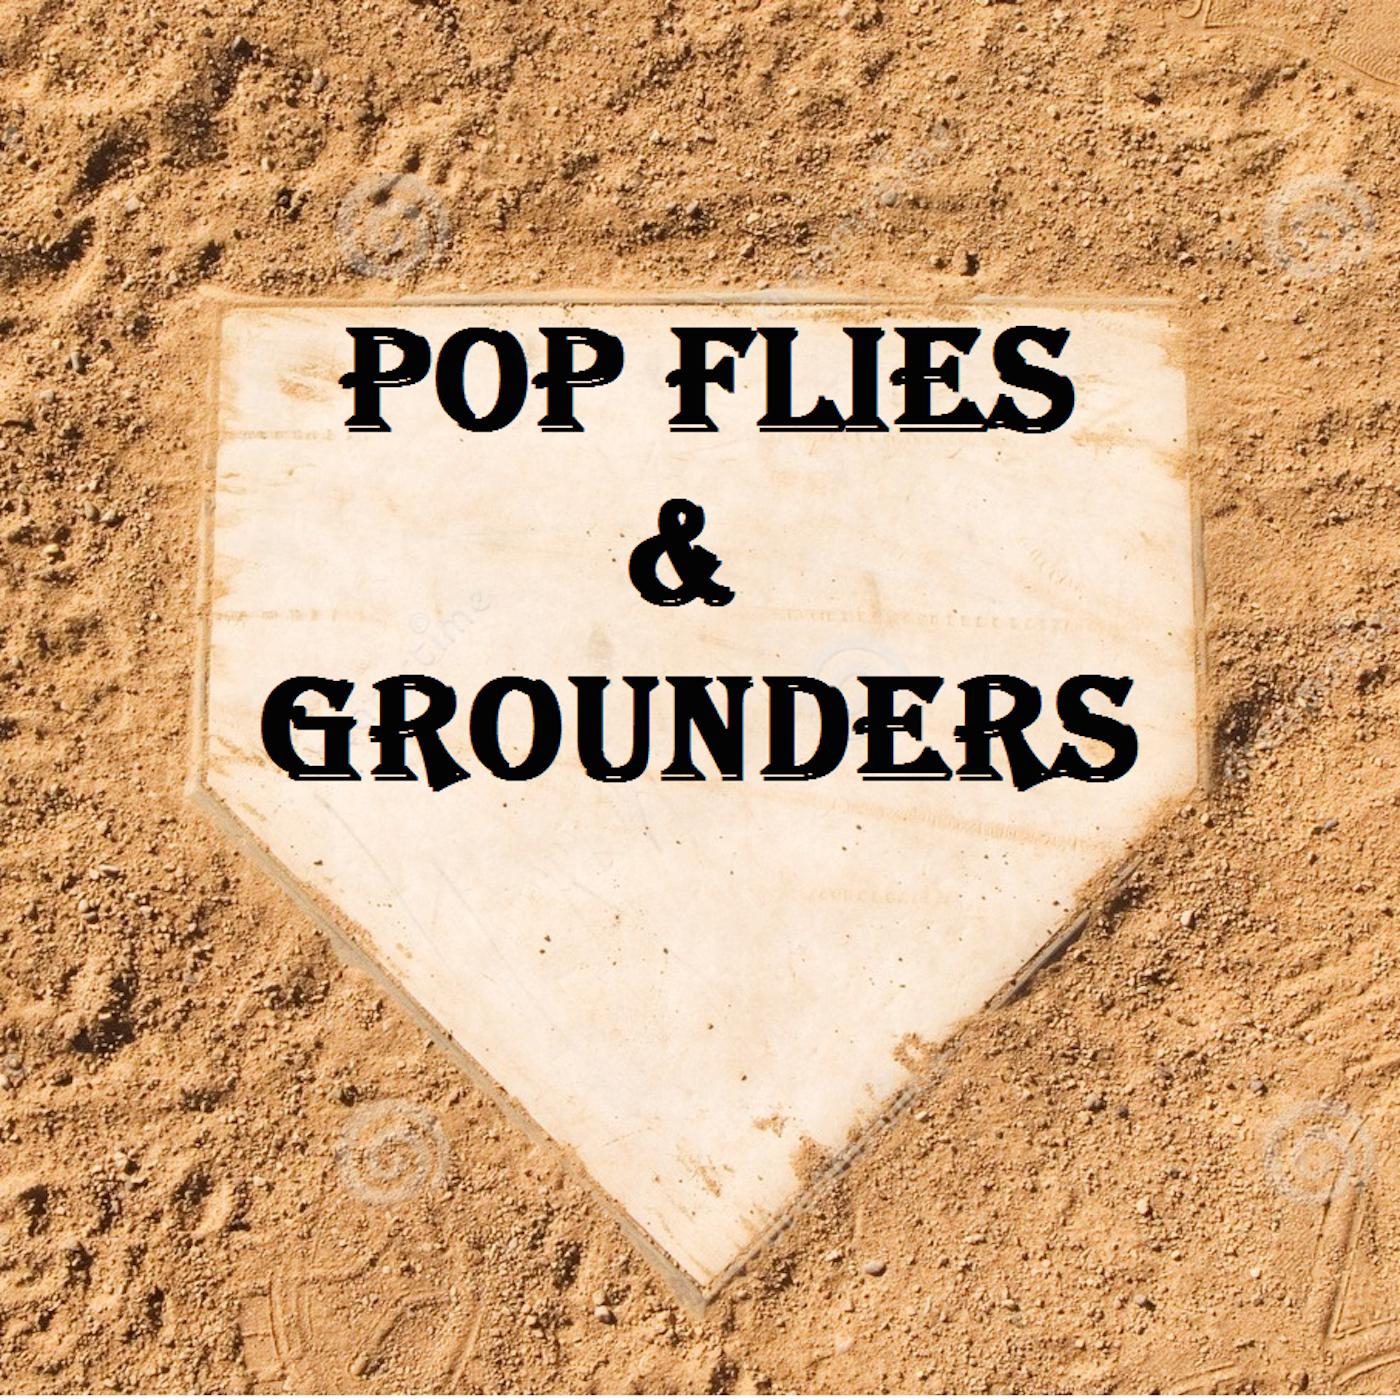 Pop Flies and Grounders